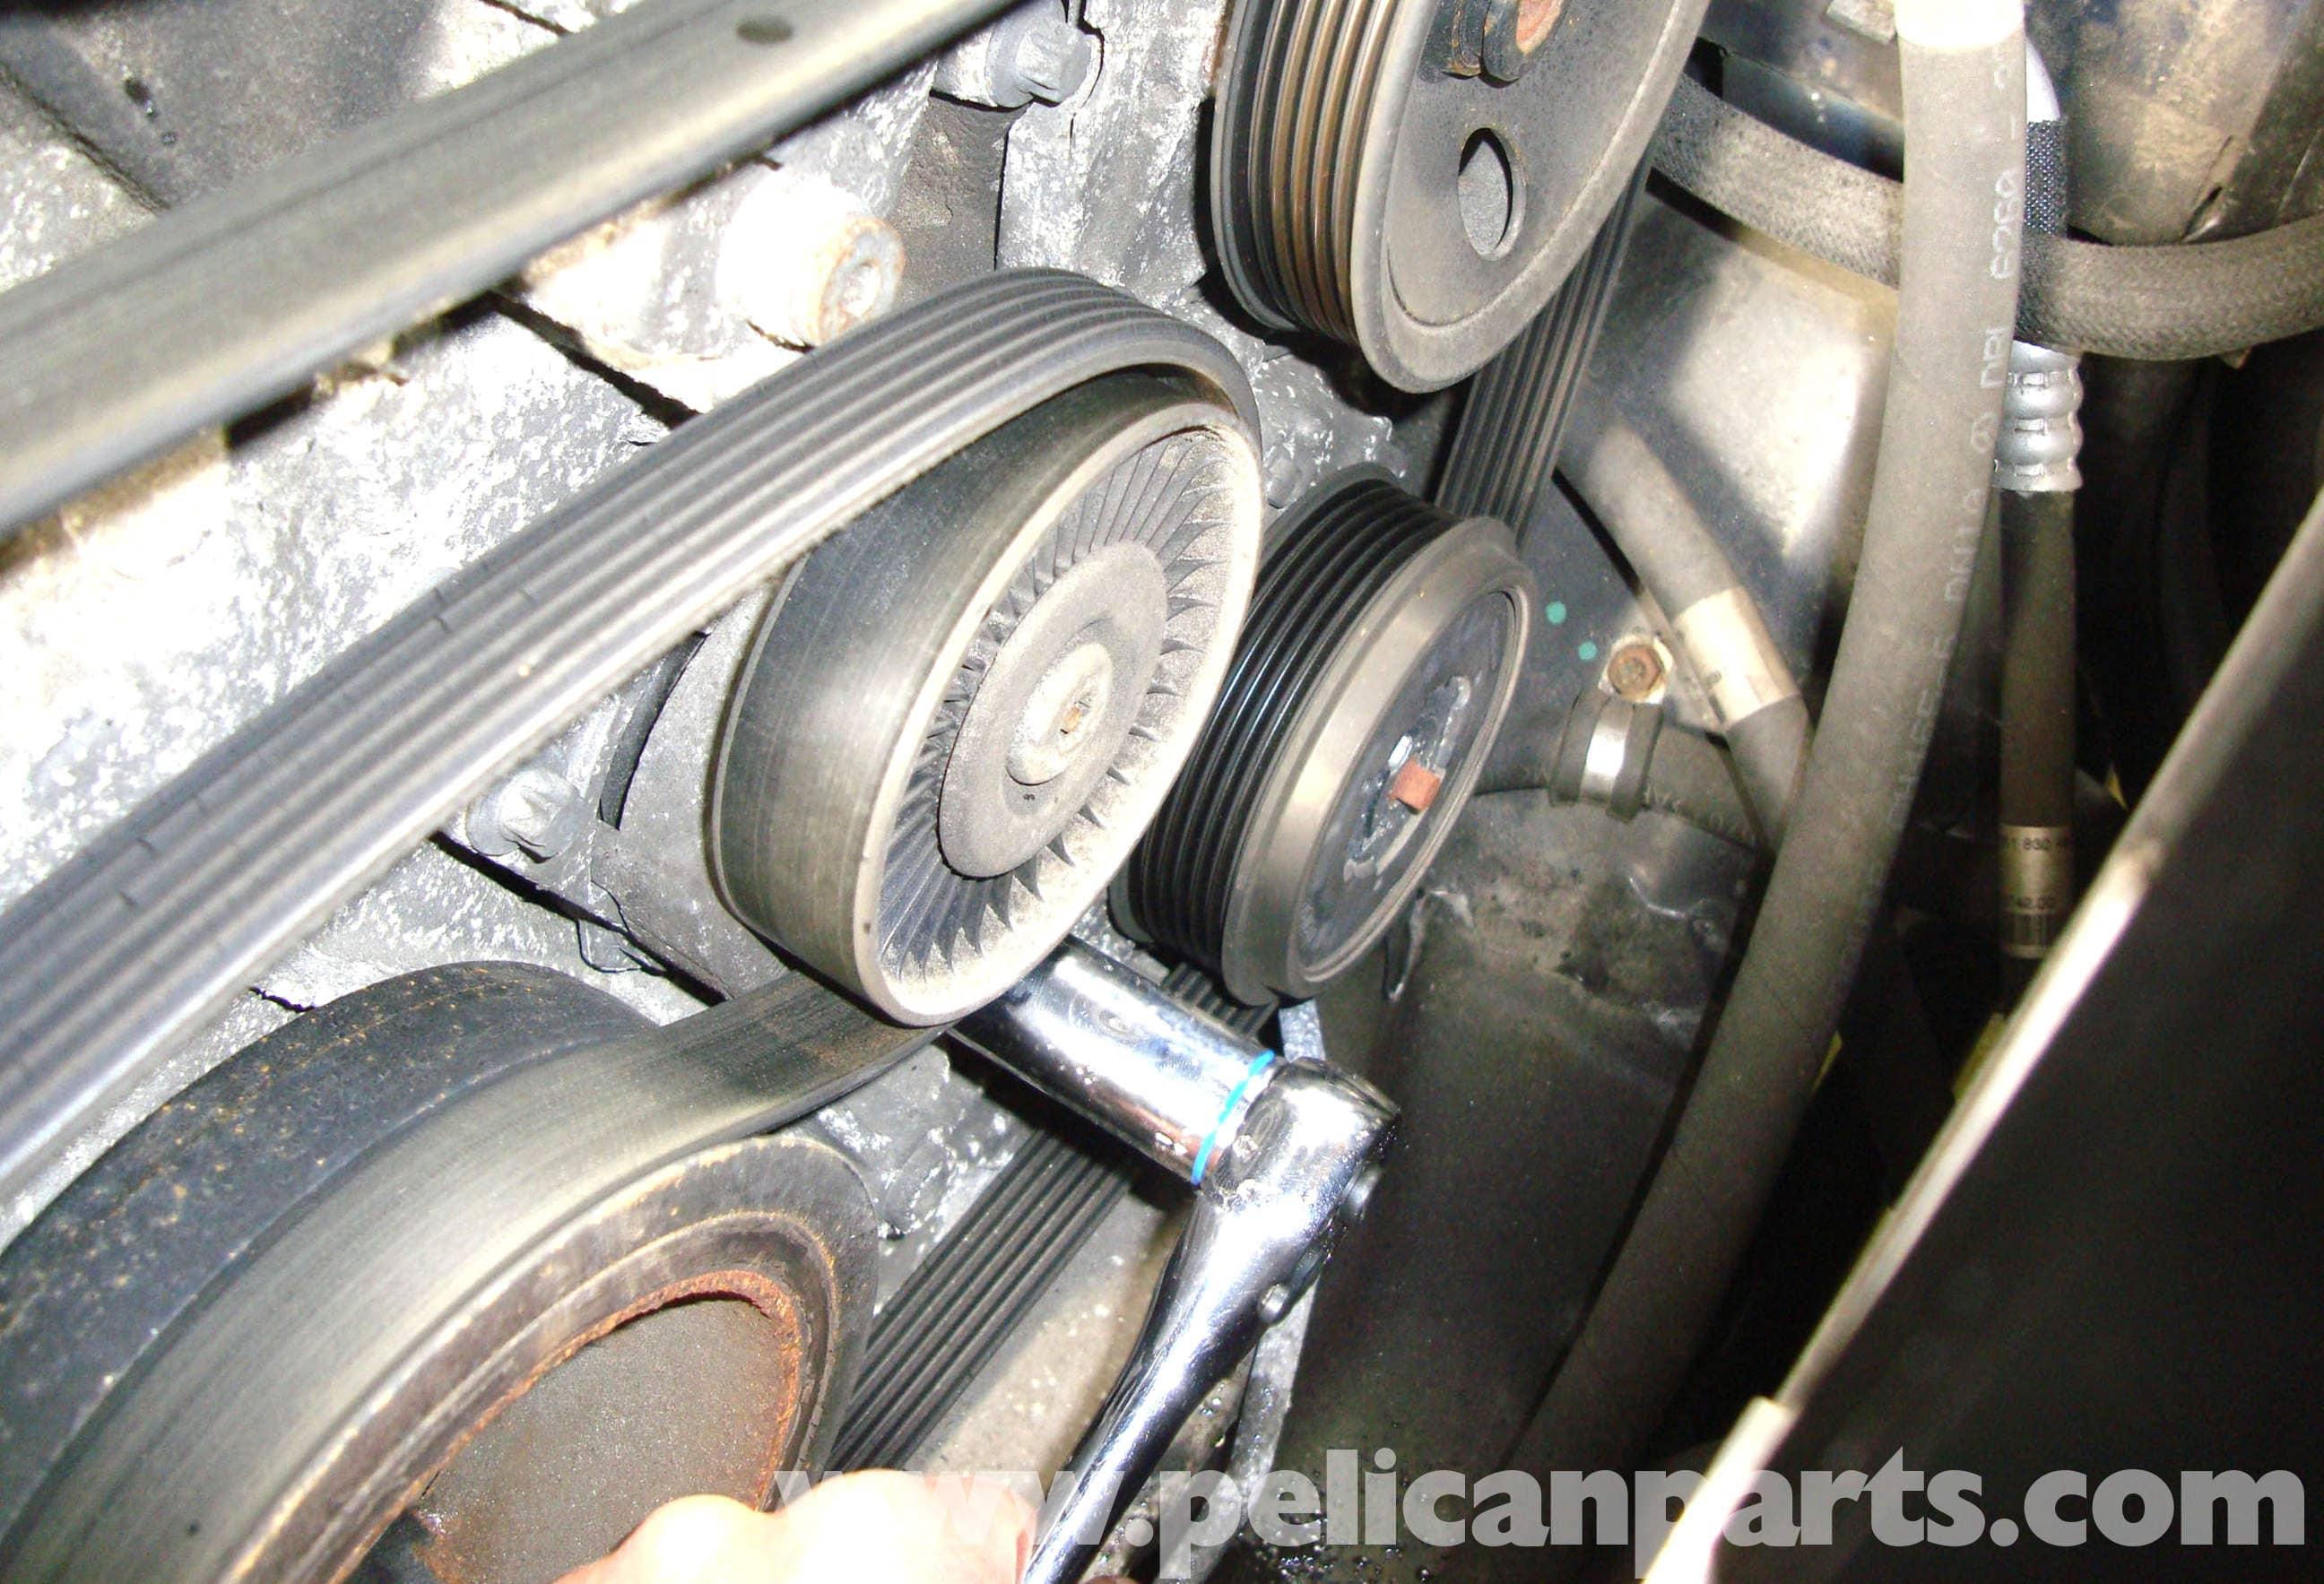 Mercedes Replacement Parts >> Mercedes-Benz W211 Accessory Drive Belt Tensioner Replacement (2003-2009) E320 | Pelican Parts ...